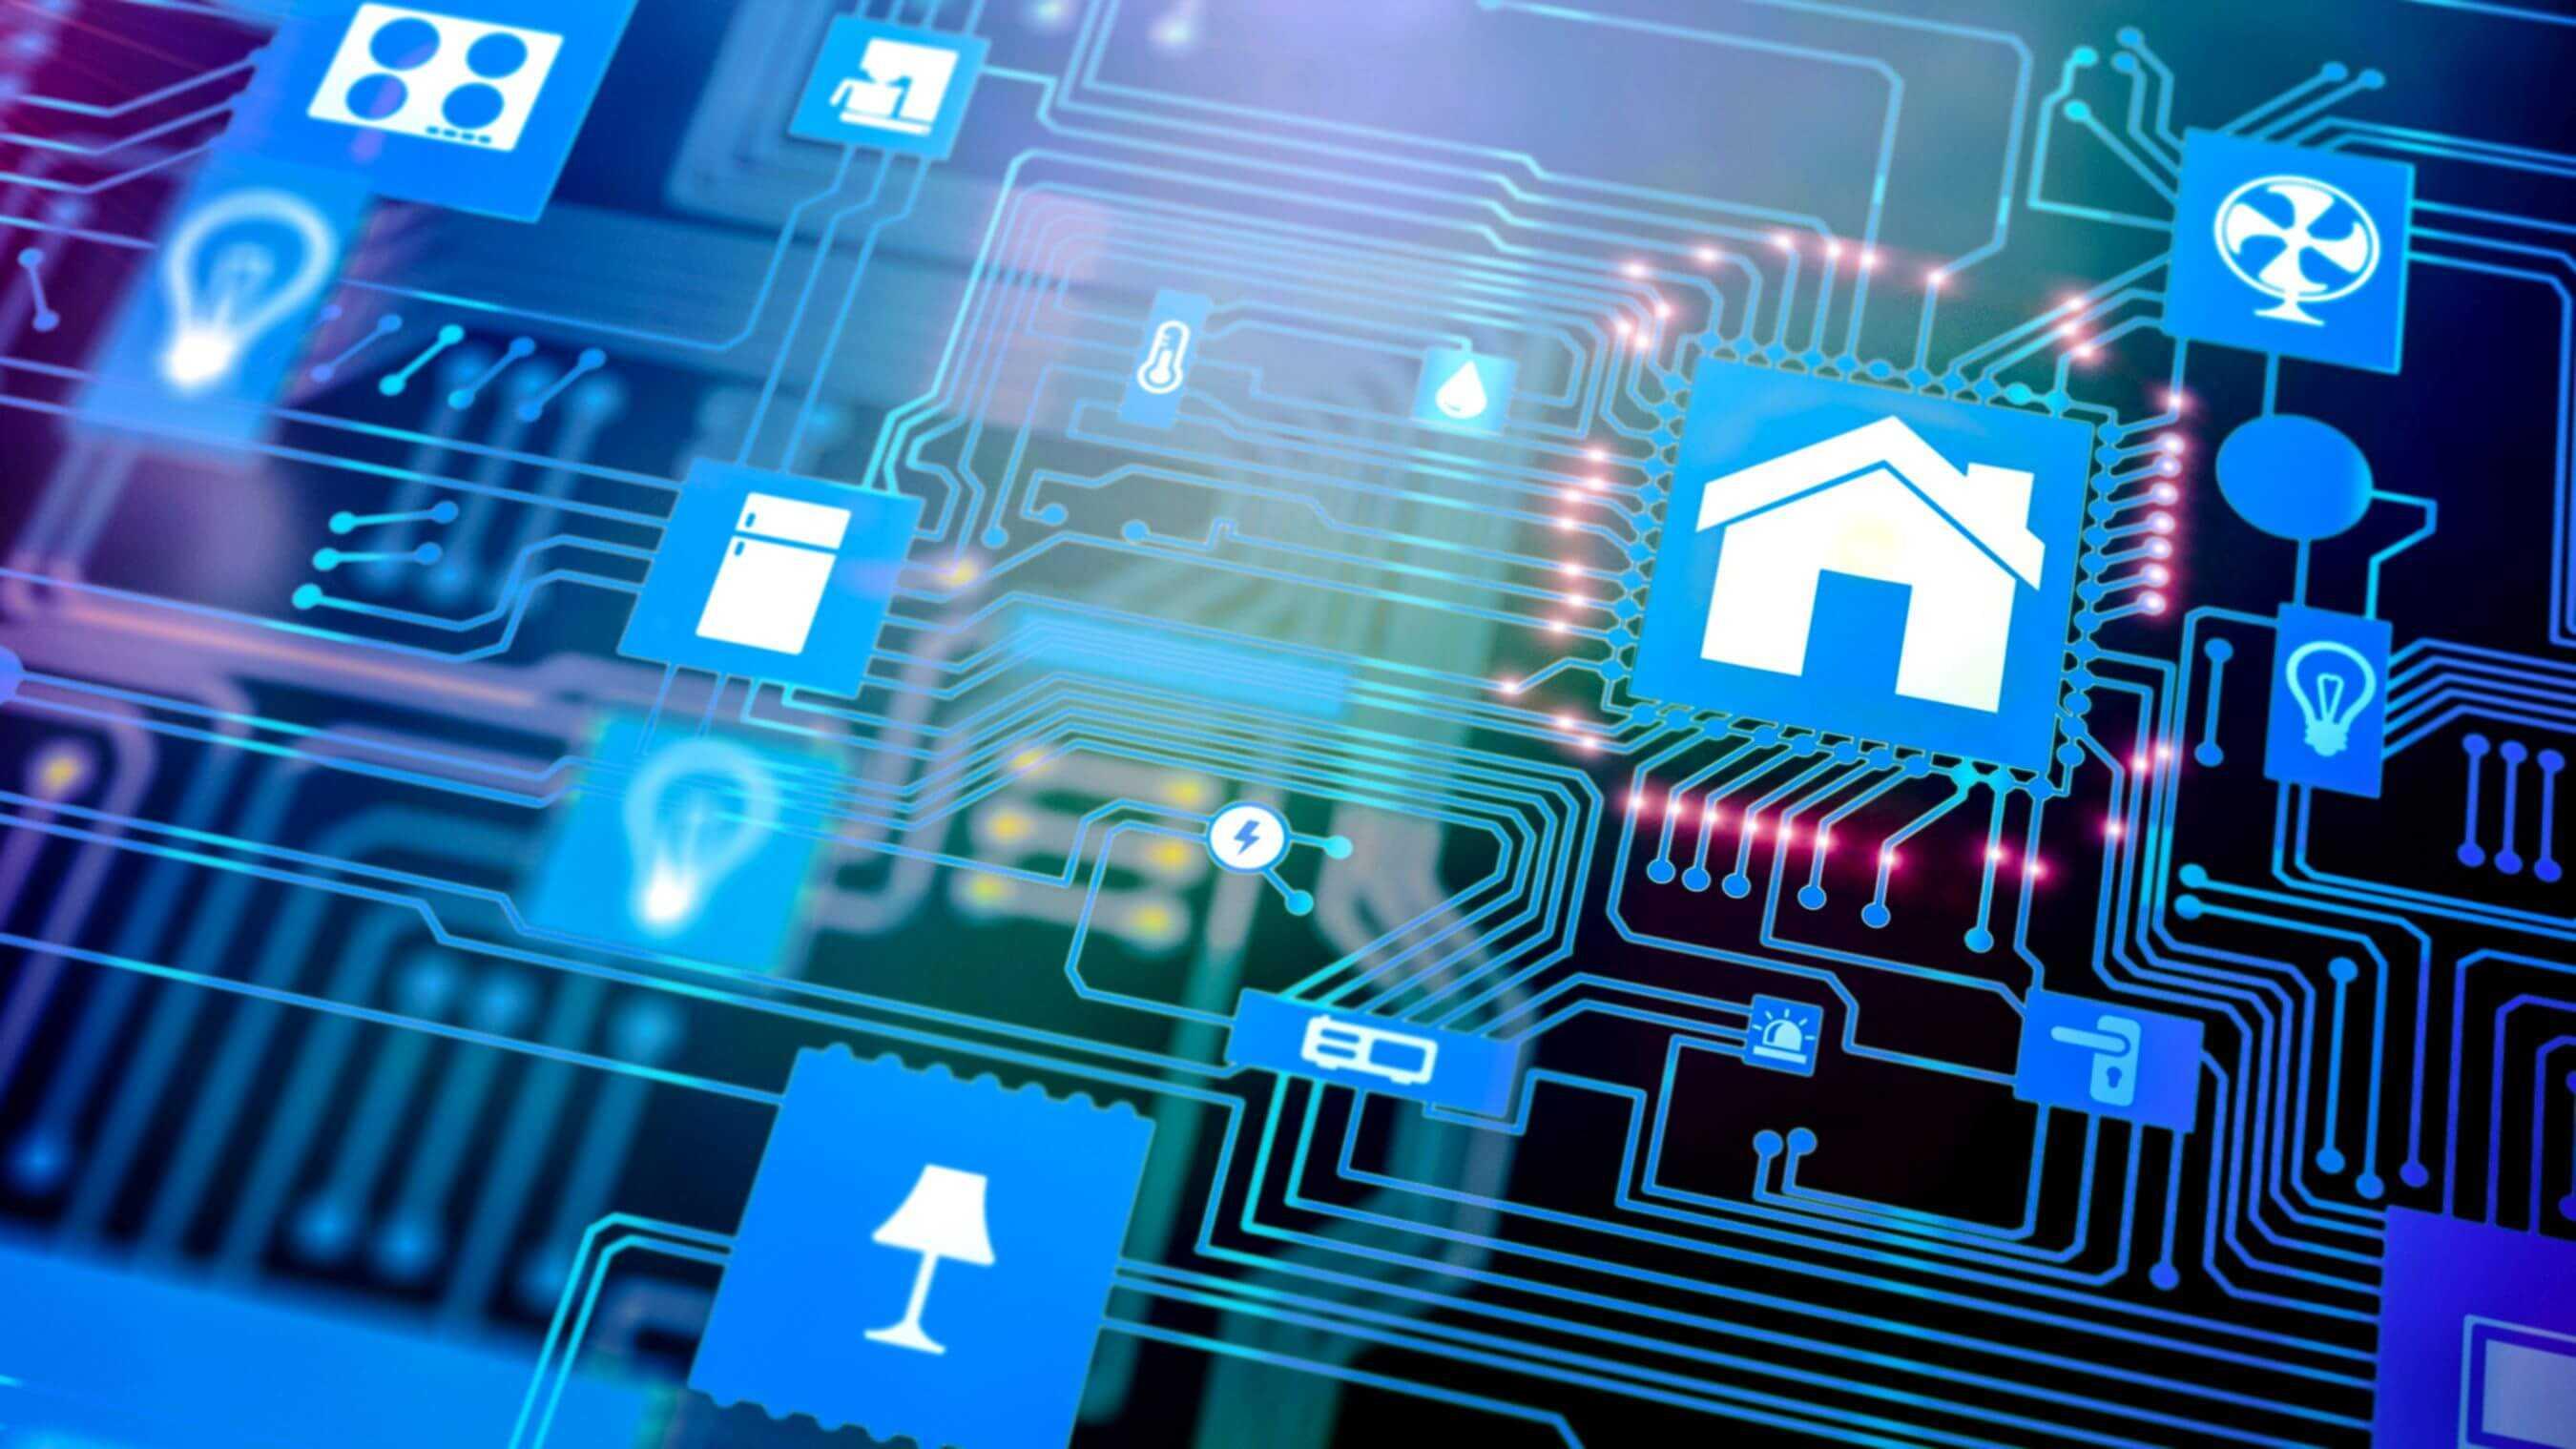 Iot в деталях: «умная» розетка - control engineering russia